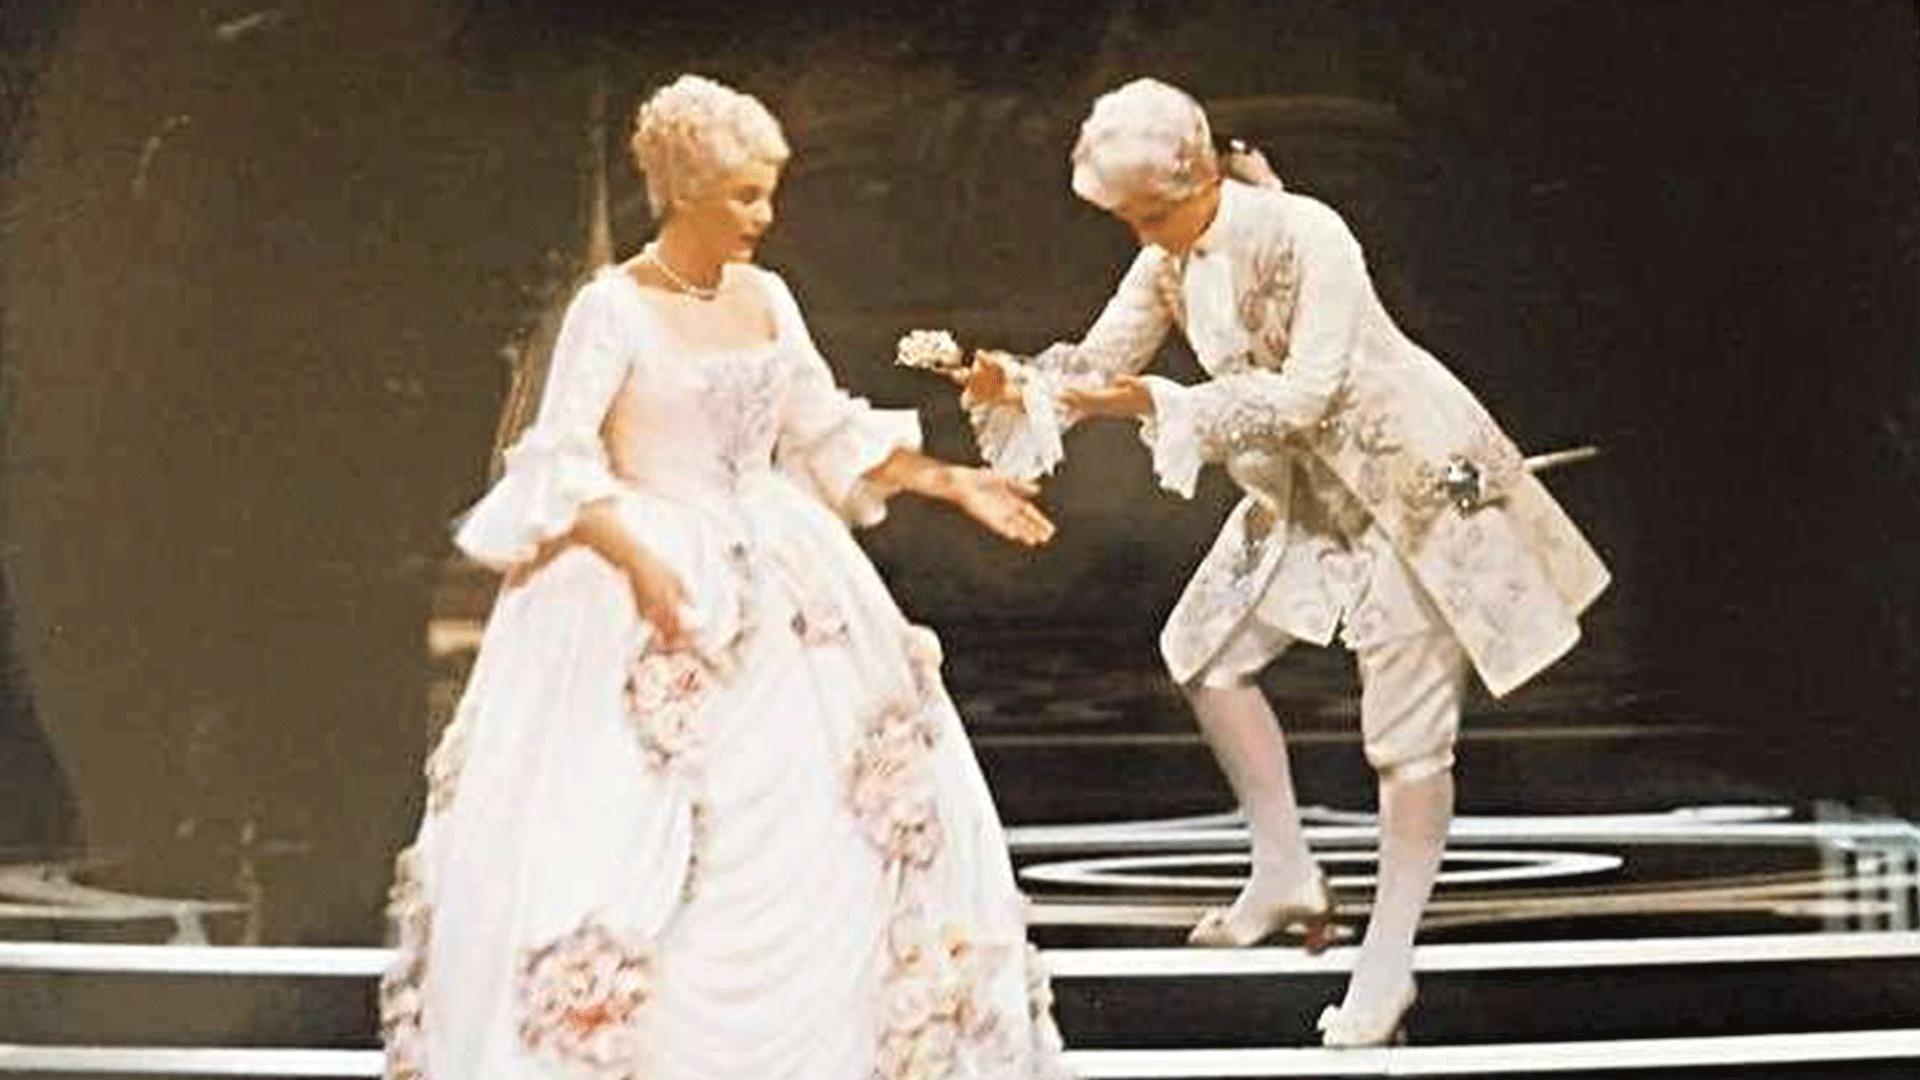 Herbert von Karajan dirige Le Chevalier à la rose de Strauss